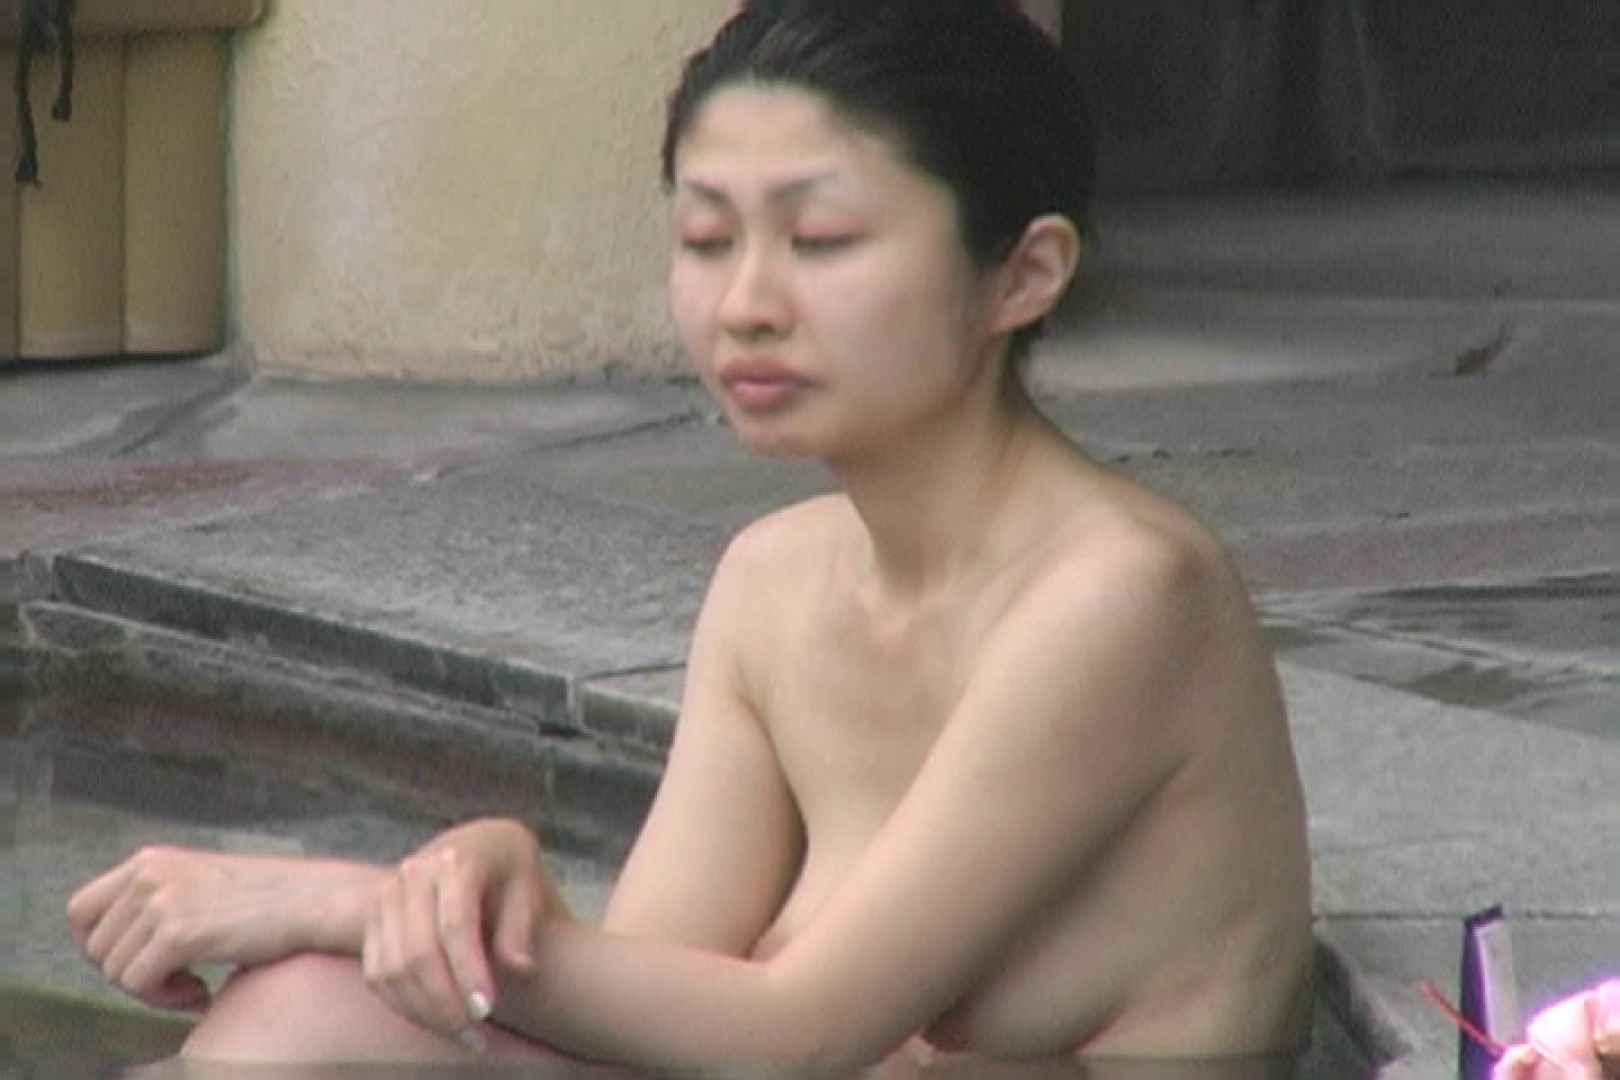 Aquaな露天風呂Vol.642 盗撮師作品 セックス画像 86pic 38